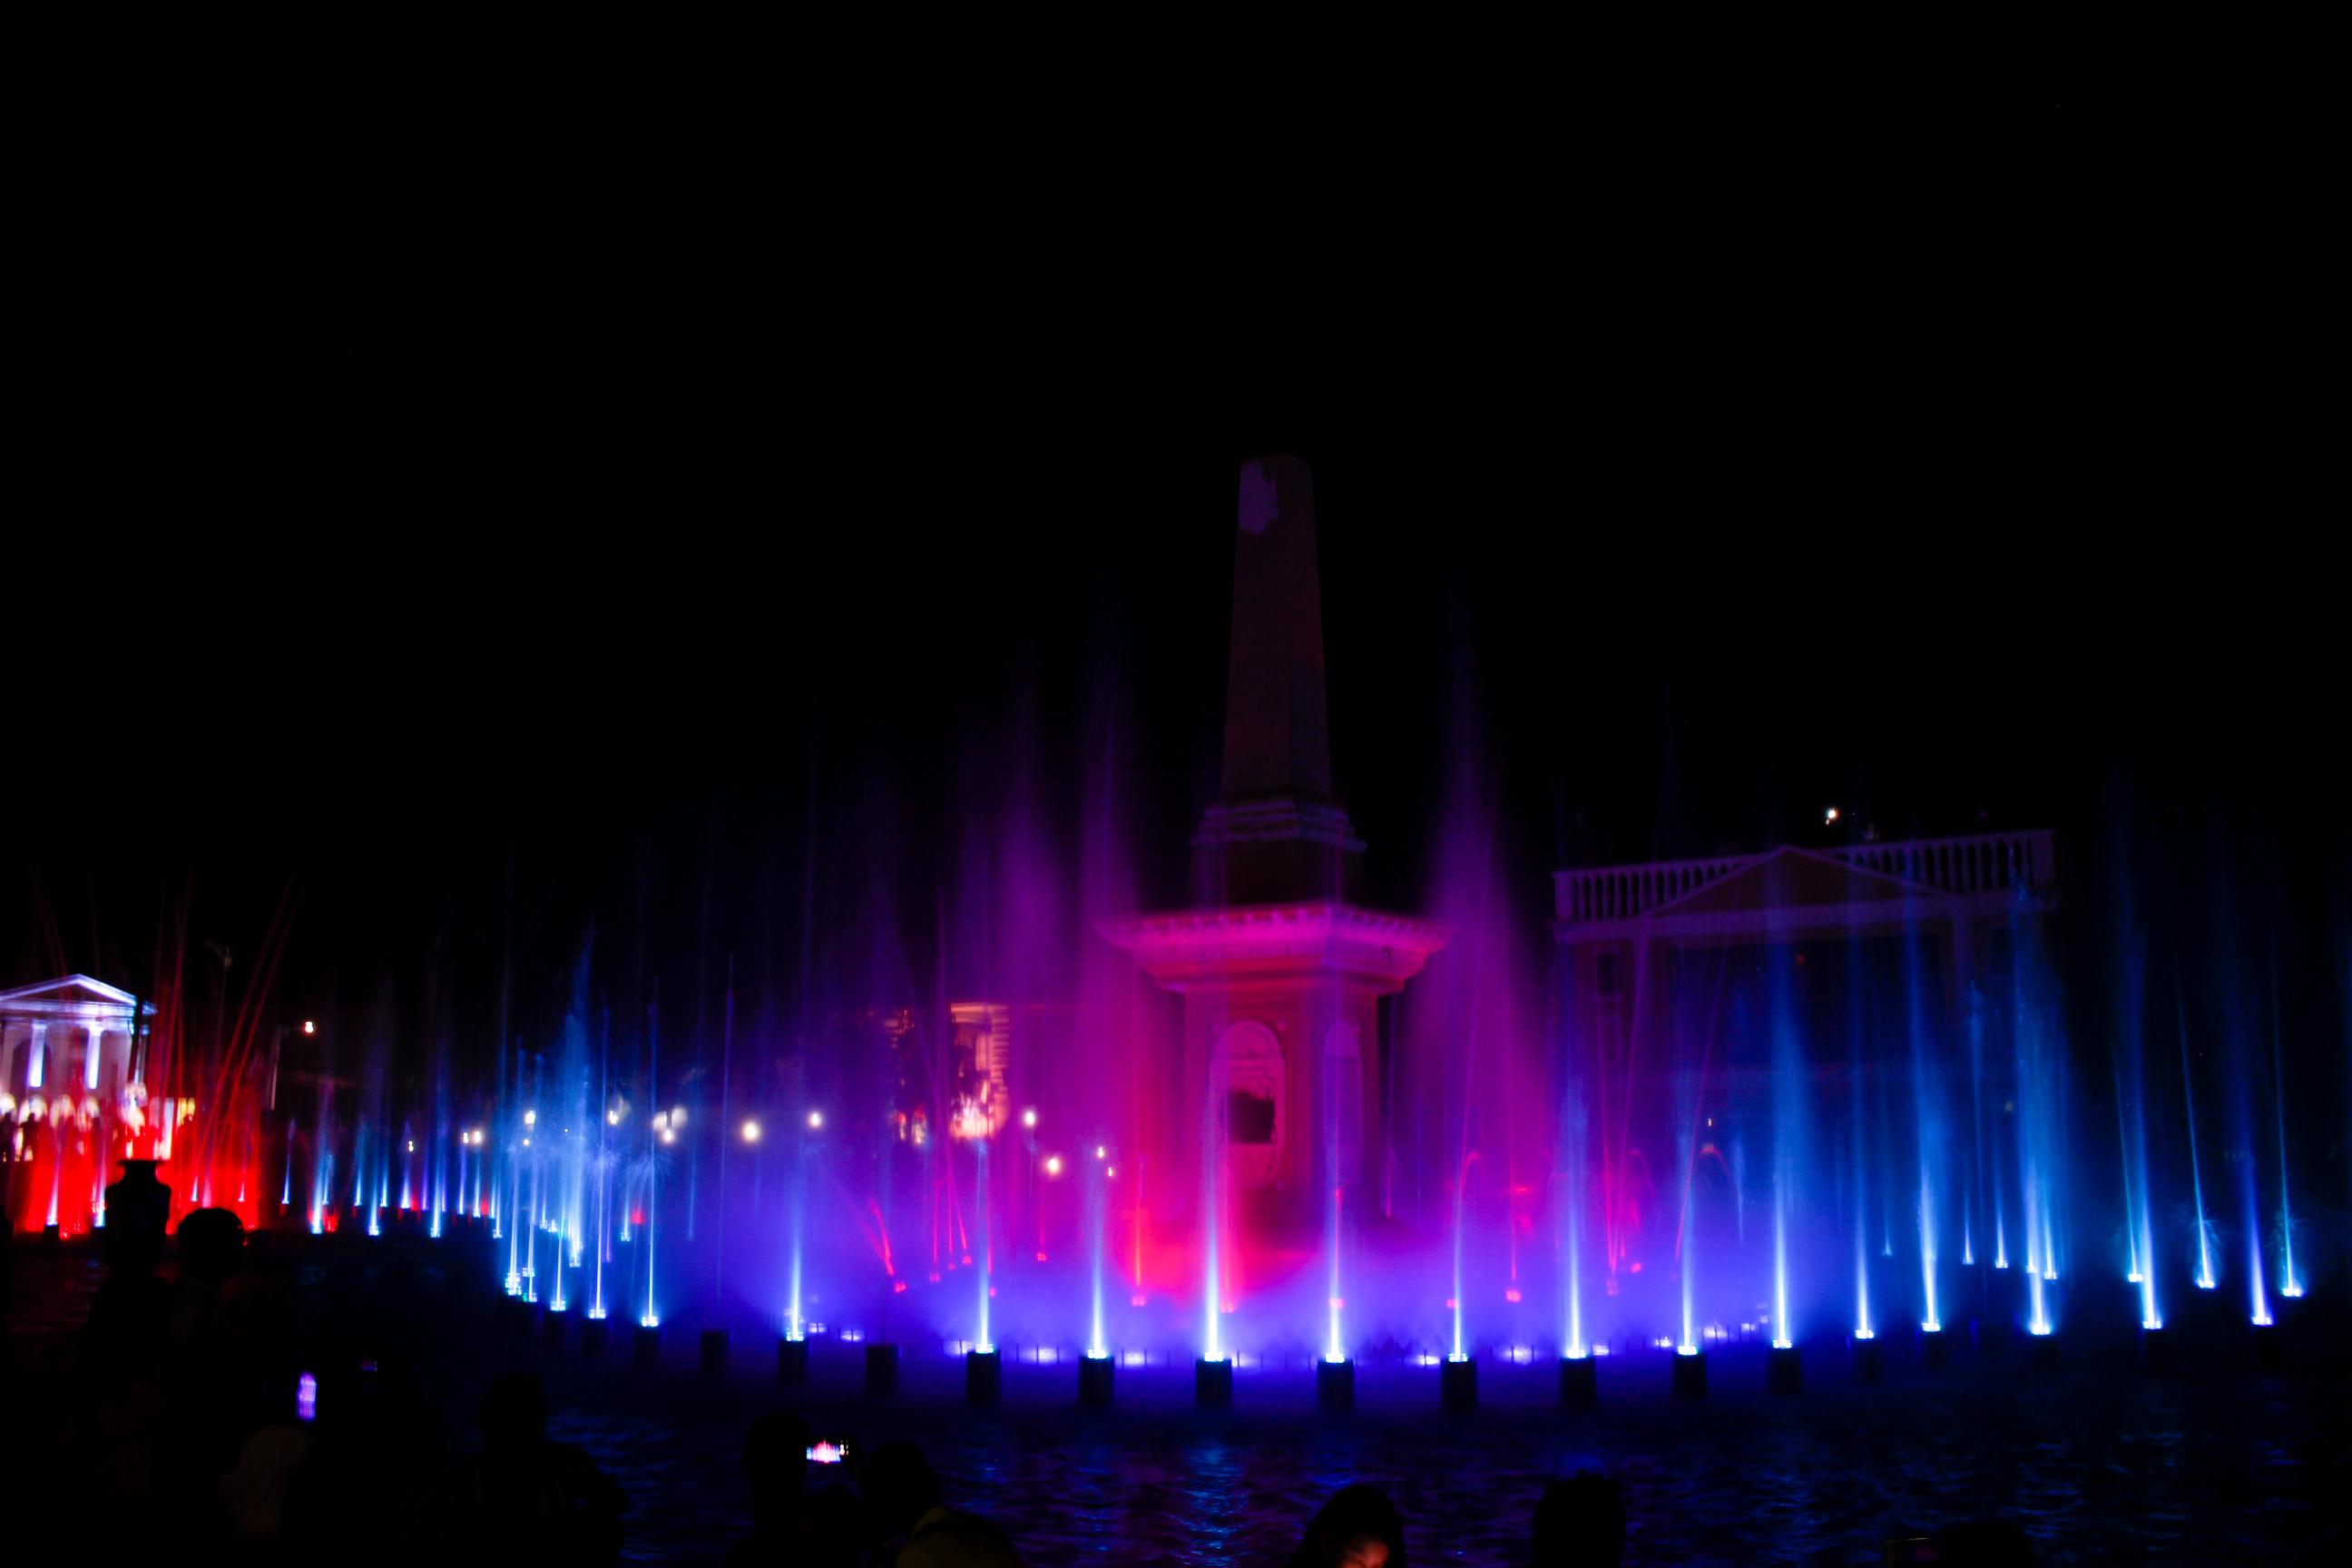 Ilocos Sur Itinerary What to Do In Ilocos Sur